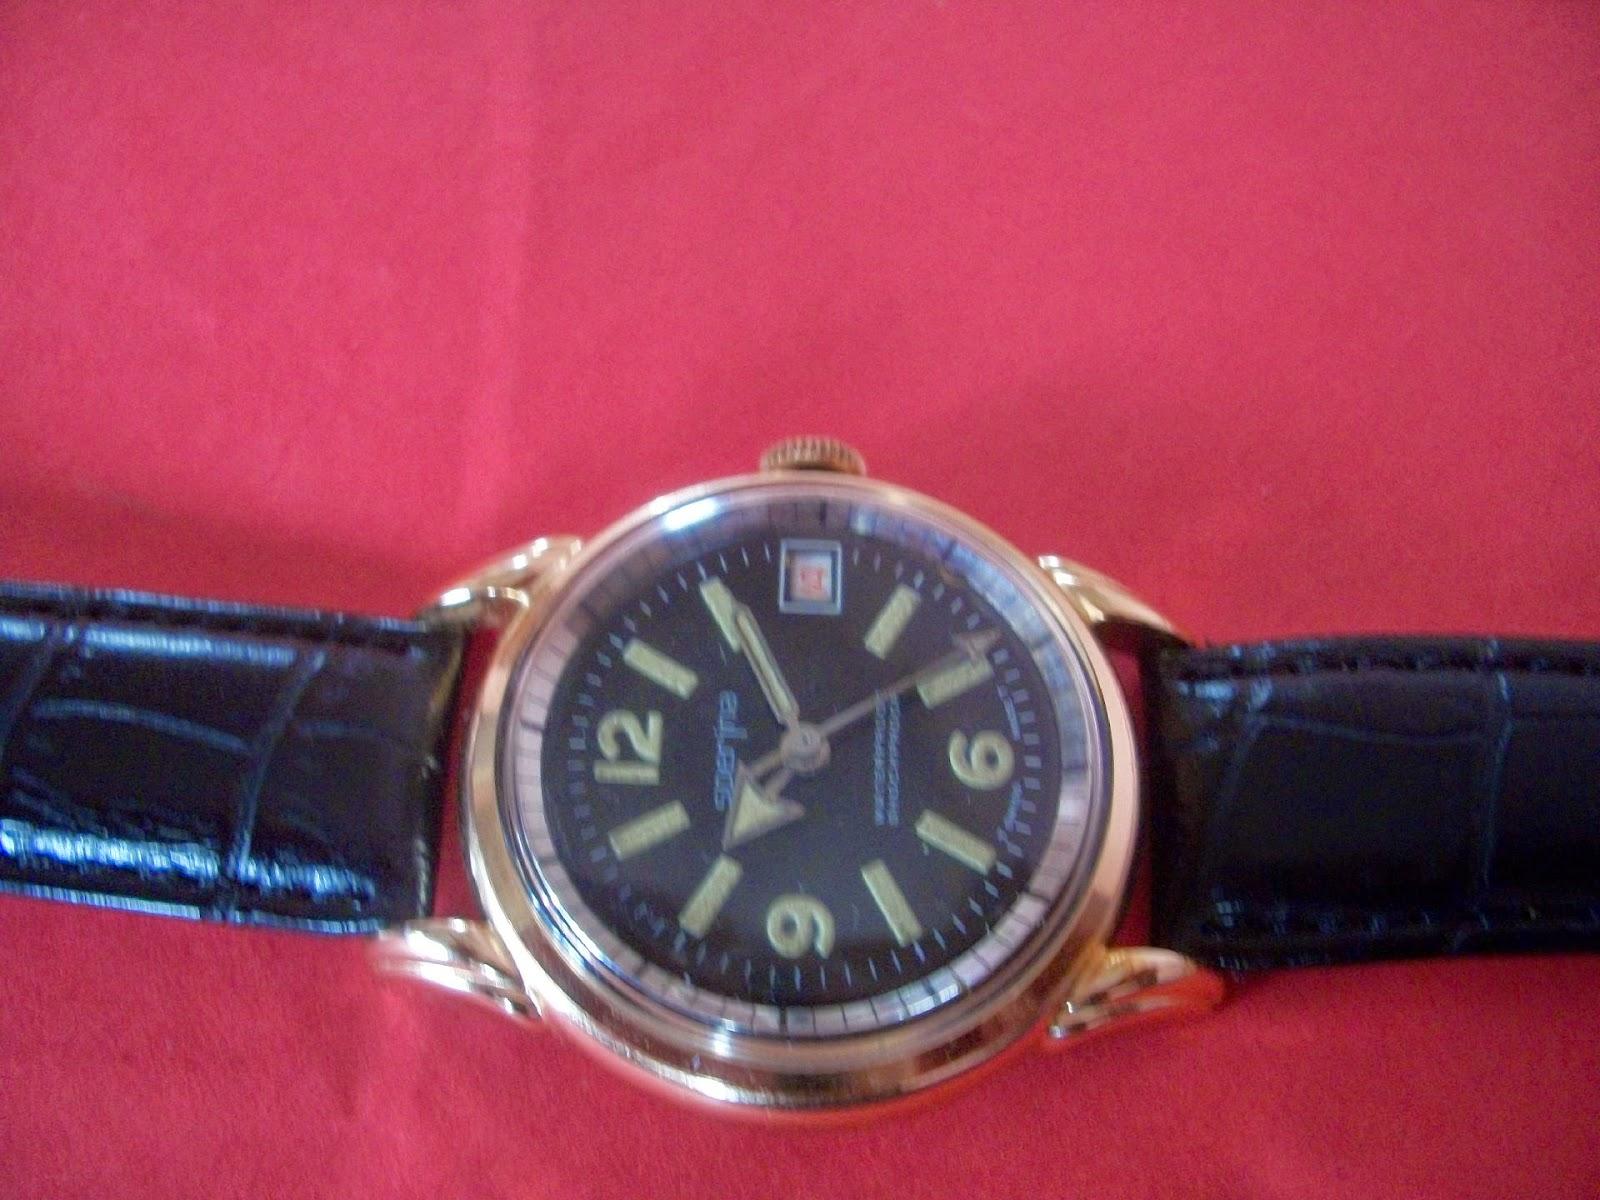 SPERINA WATCH Co. hand-wound mechanical watch swiss made